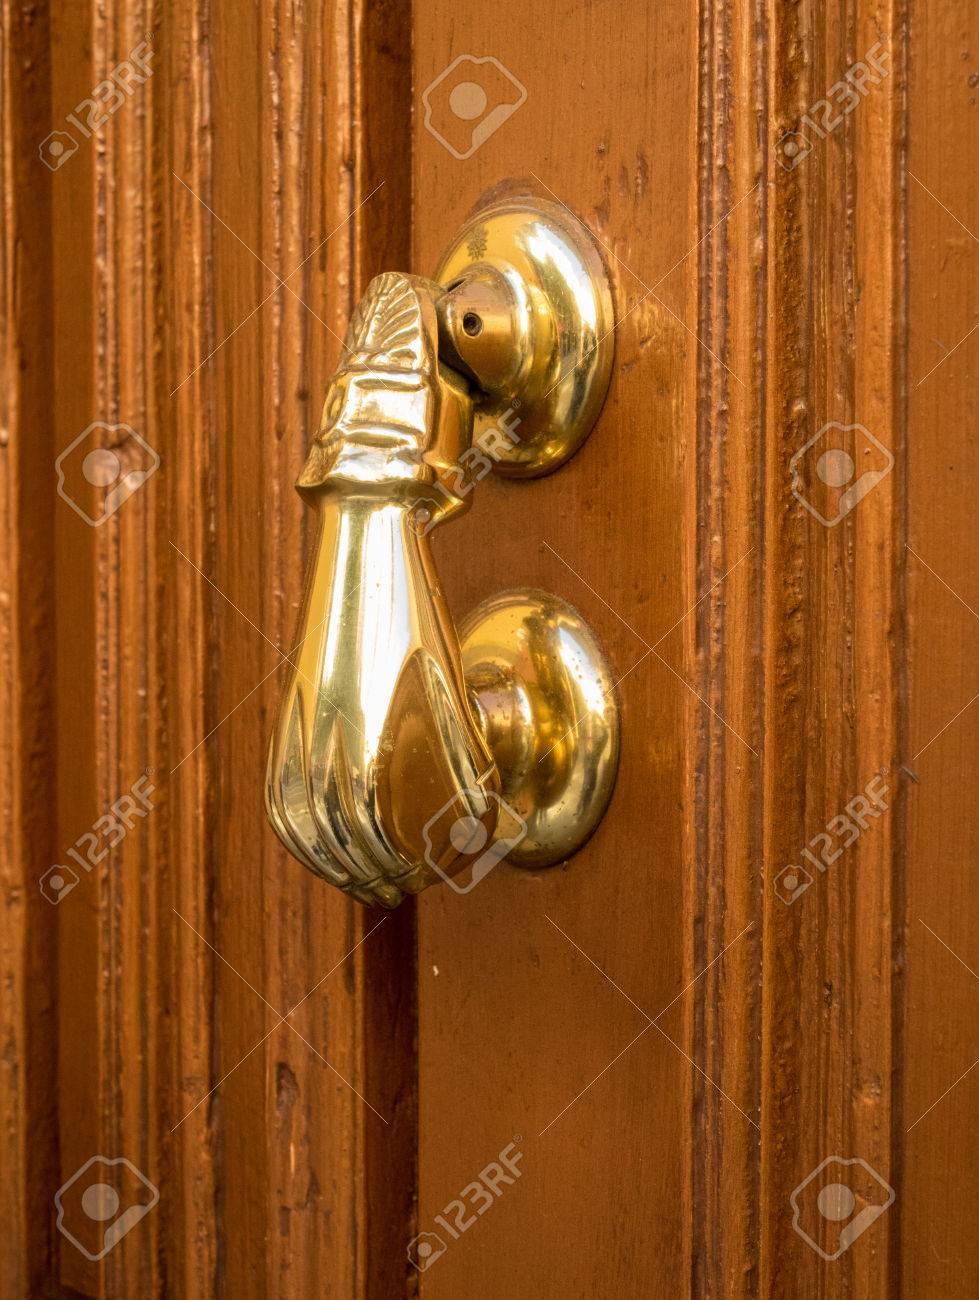 brass door knocker. side view of brass door knocker shaped like a hand on old wooden stock photo